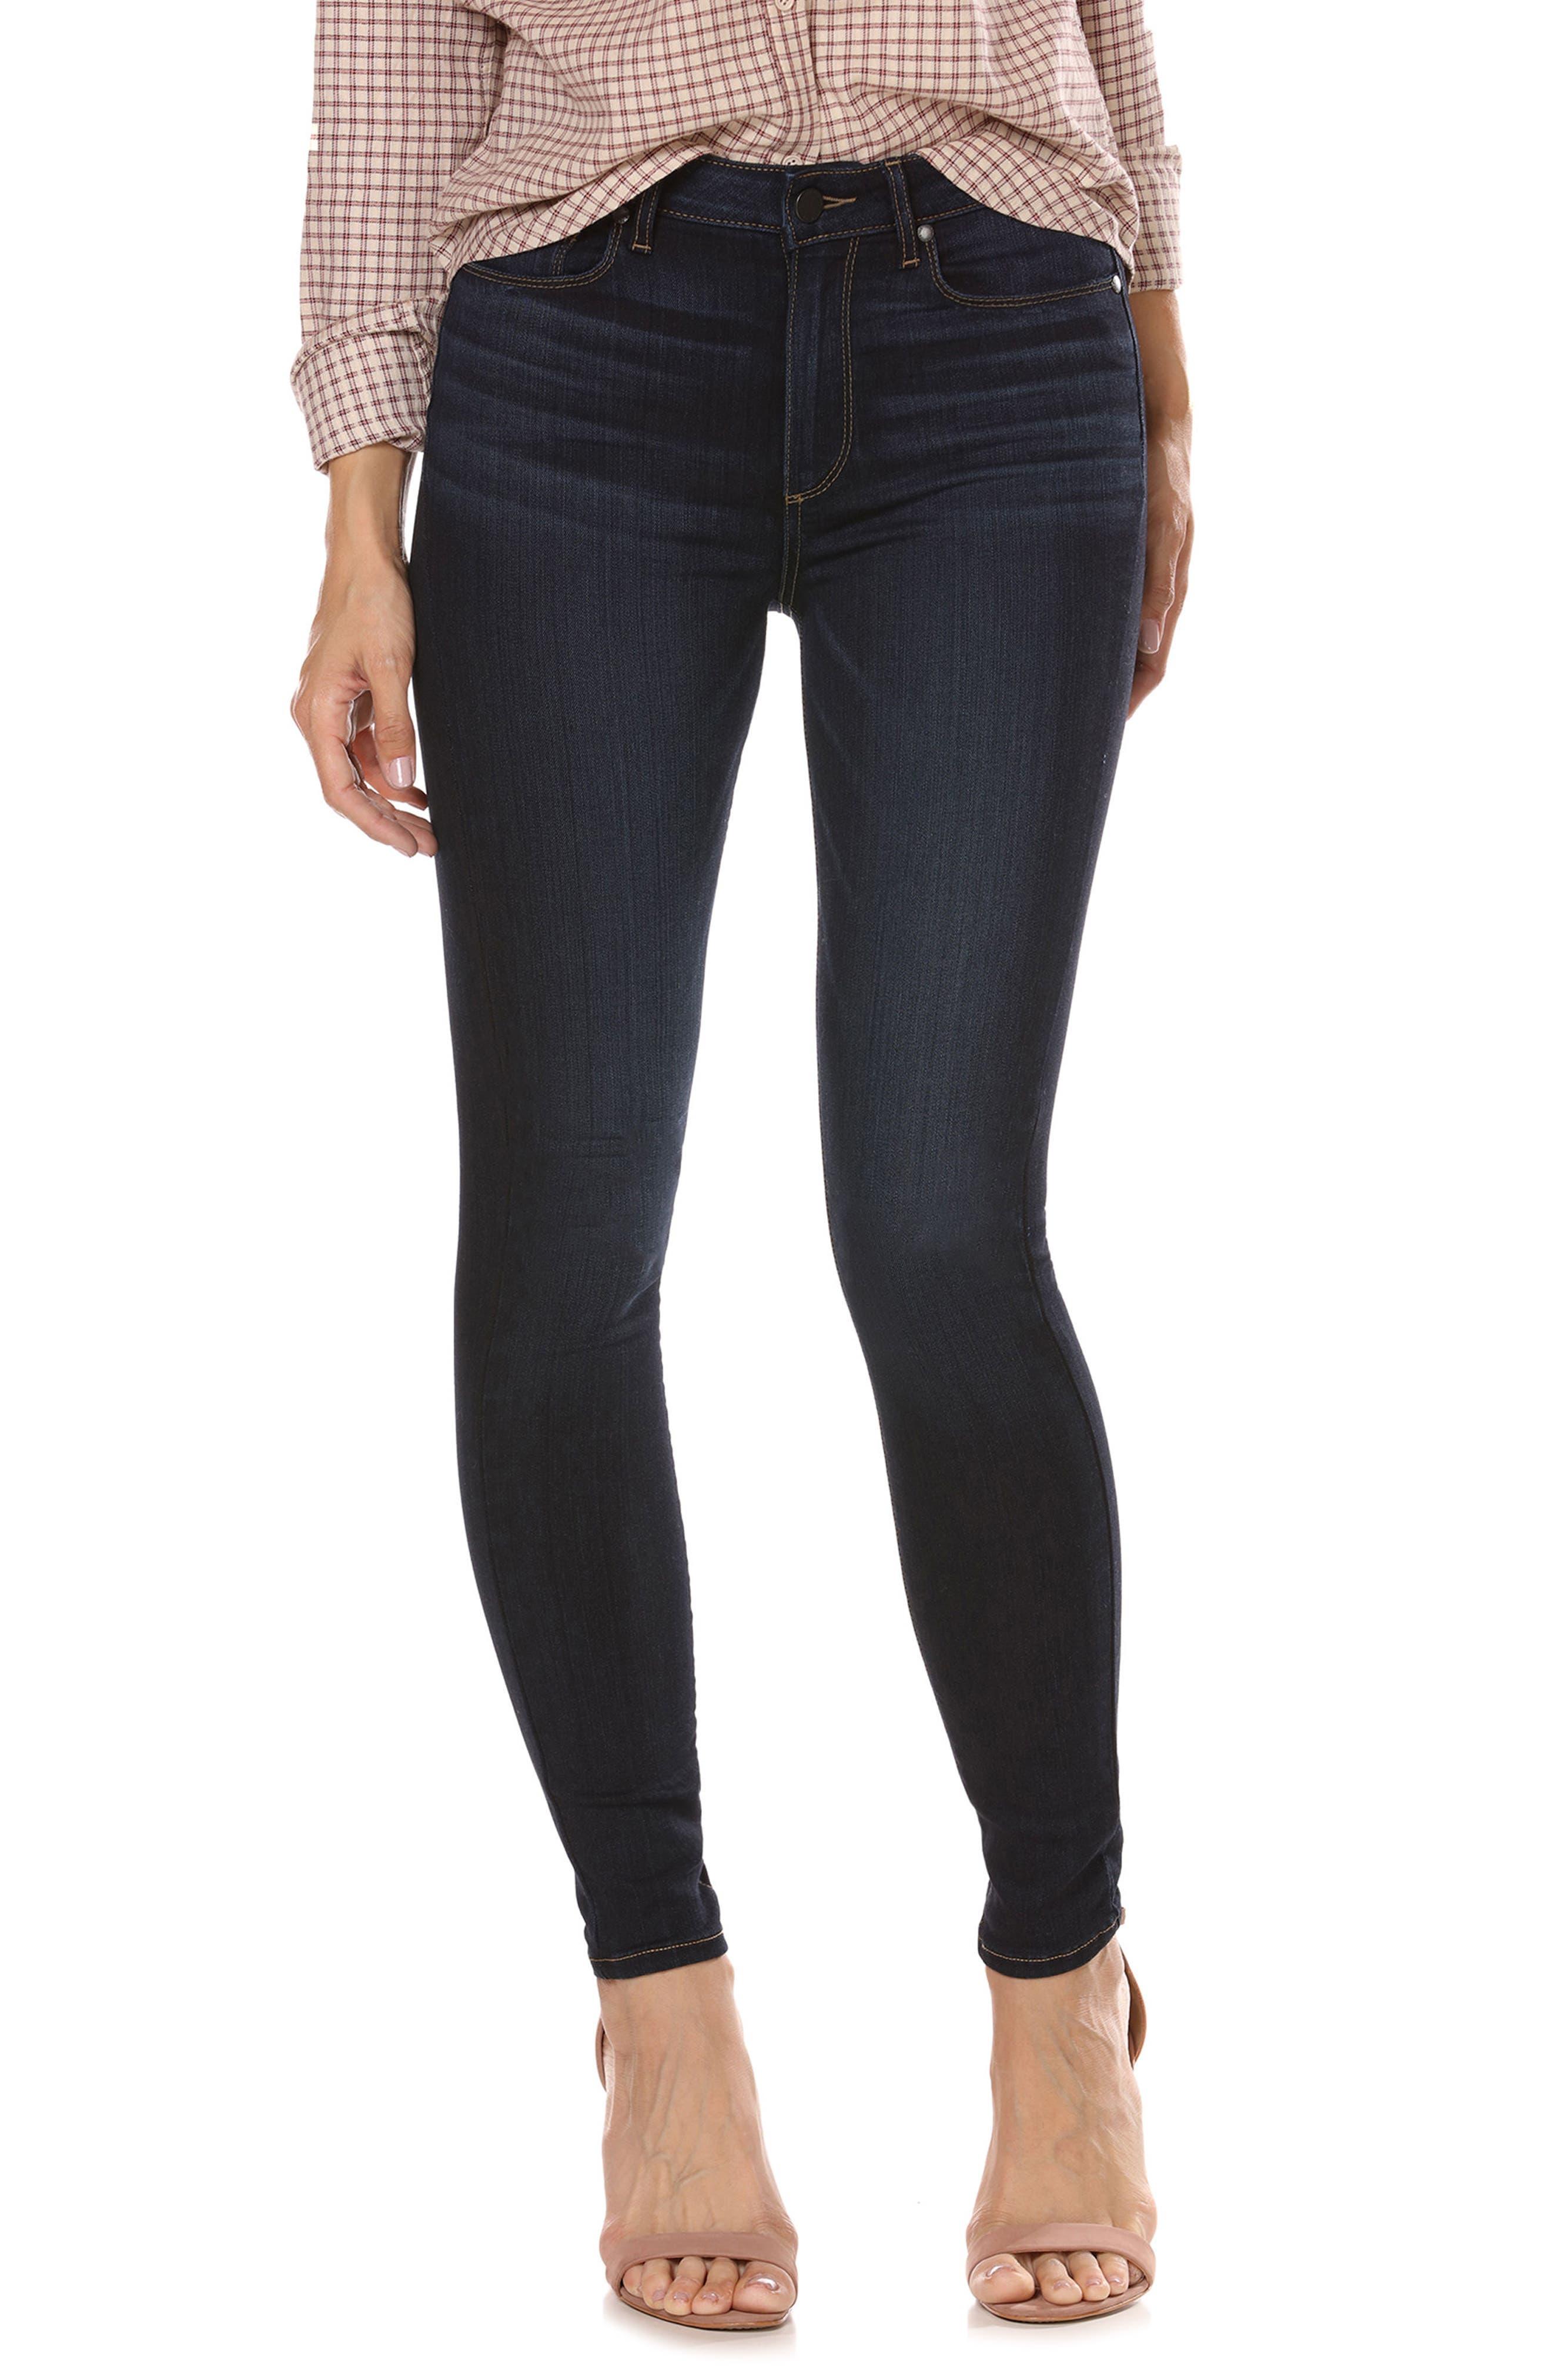 PAIGE Transcend - Hoxton High Waist Ankle Skinny Jeans (Koda)